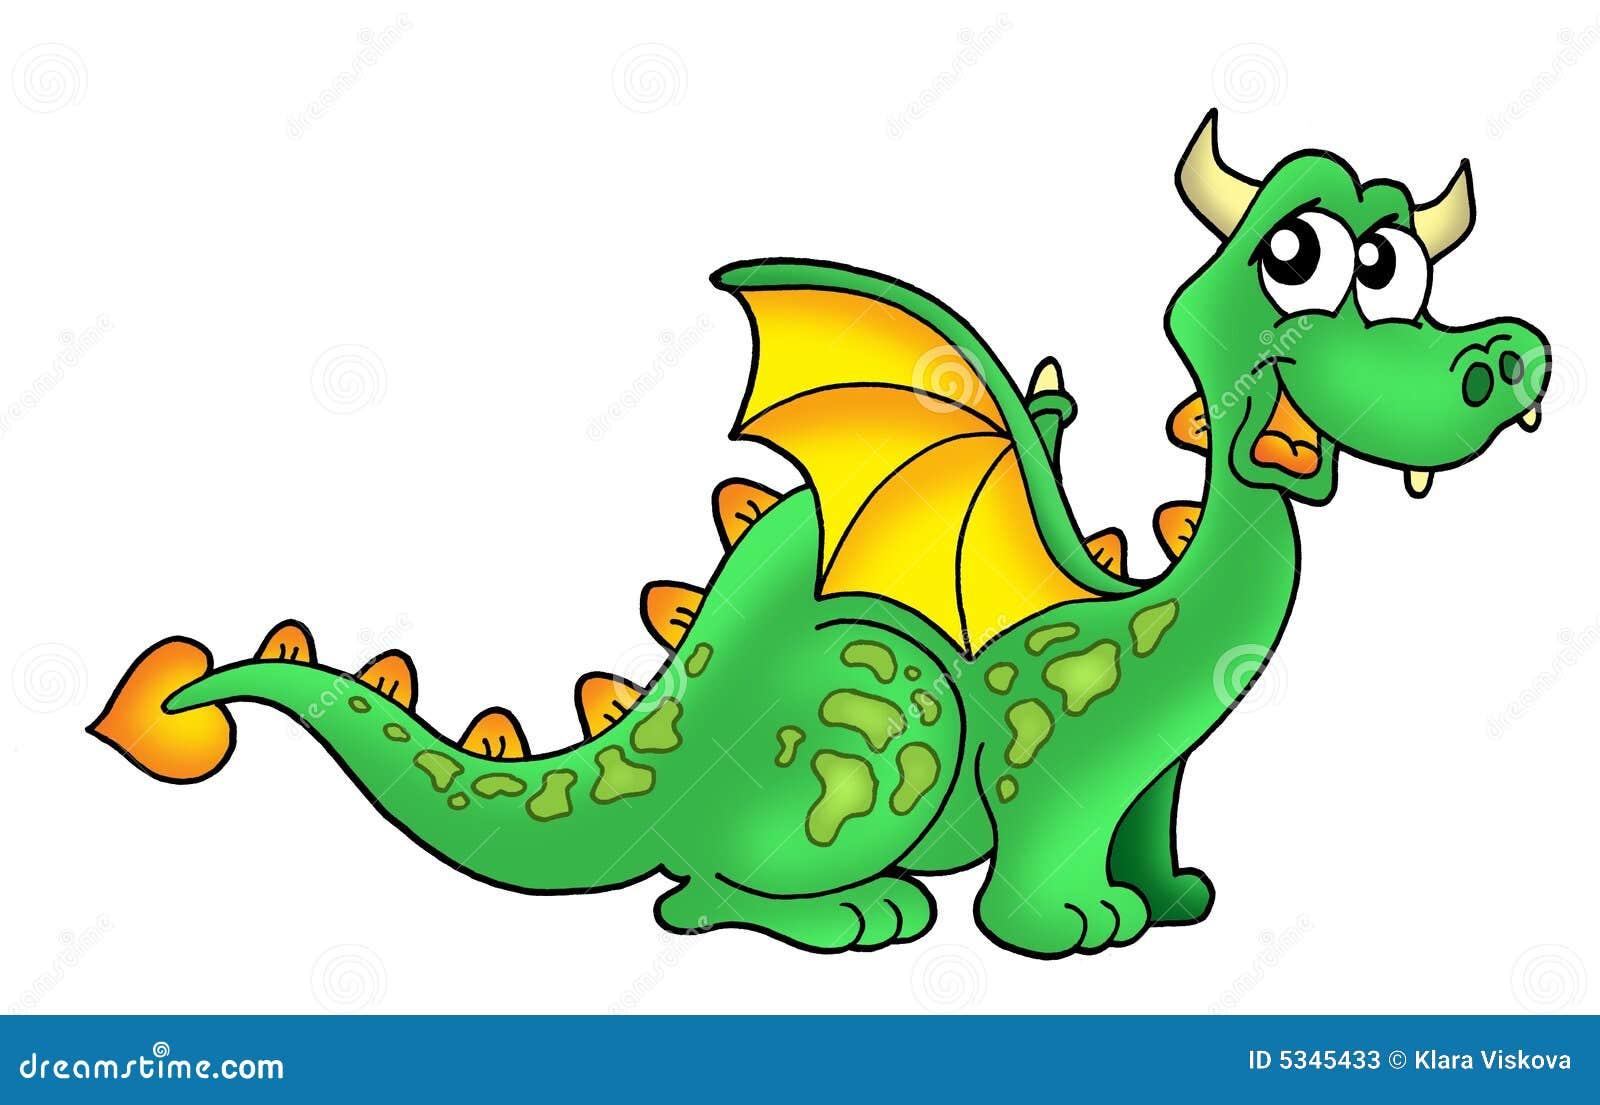 Cute green dragon stock illustration. Illustration of dragon - 5603272